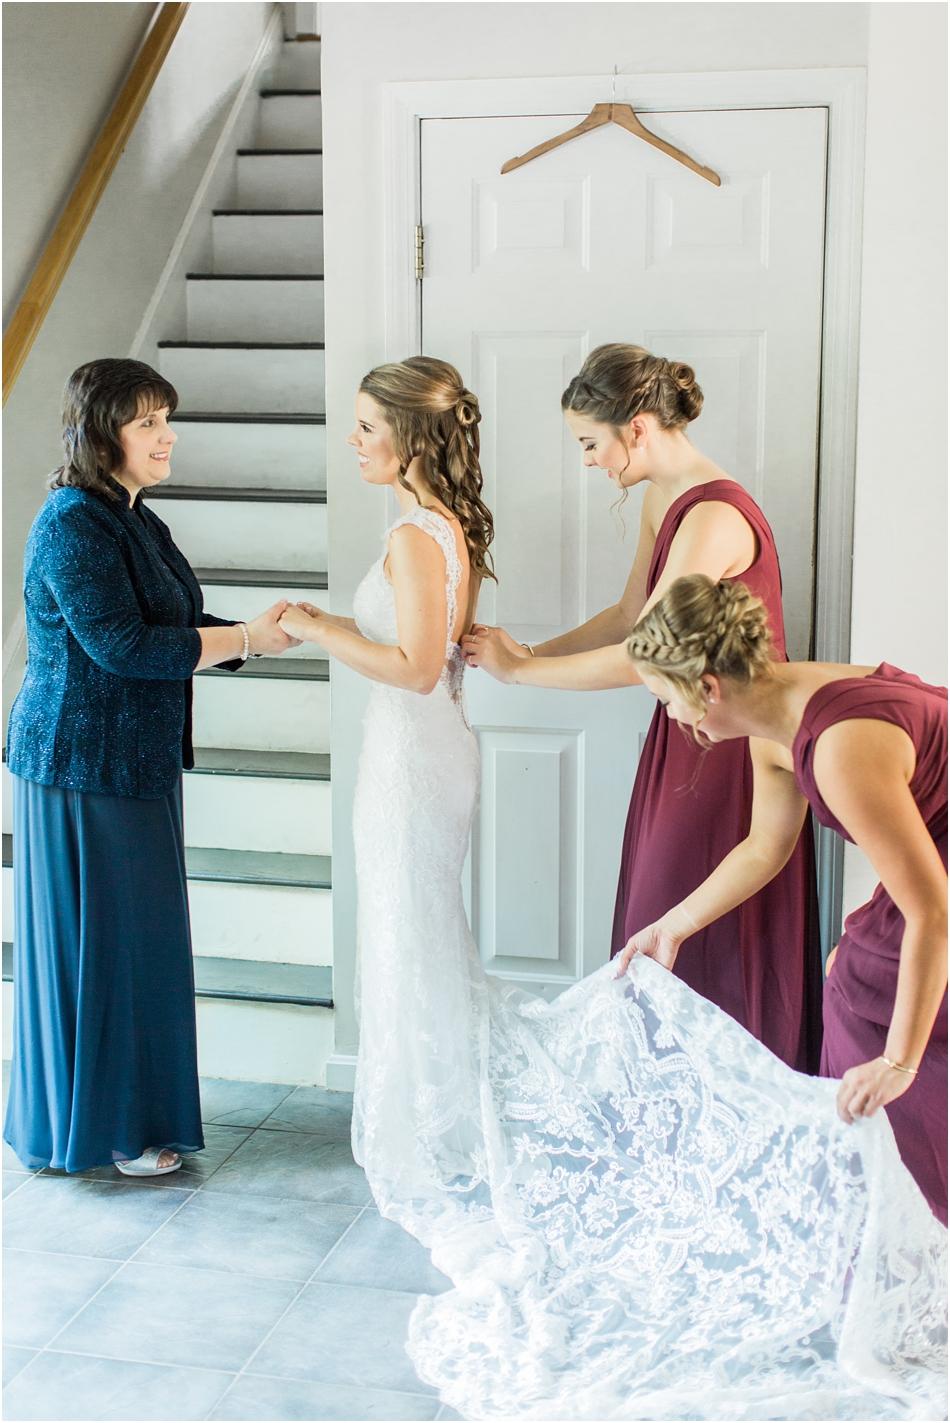 south_shore_country_club_hingham_amanda_chris_cape_cod_boston_new_england_wedding_photographer_Meredith_Jane_Photography_photo_2702.jpg